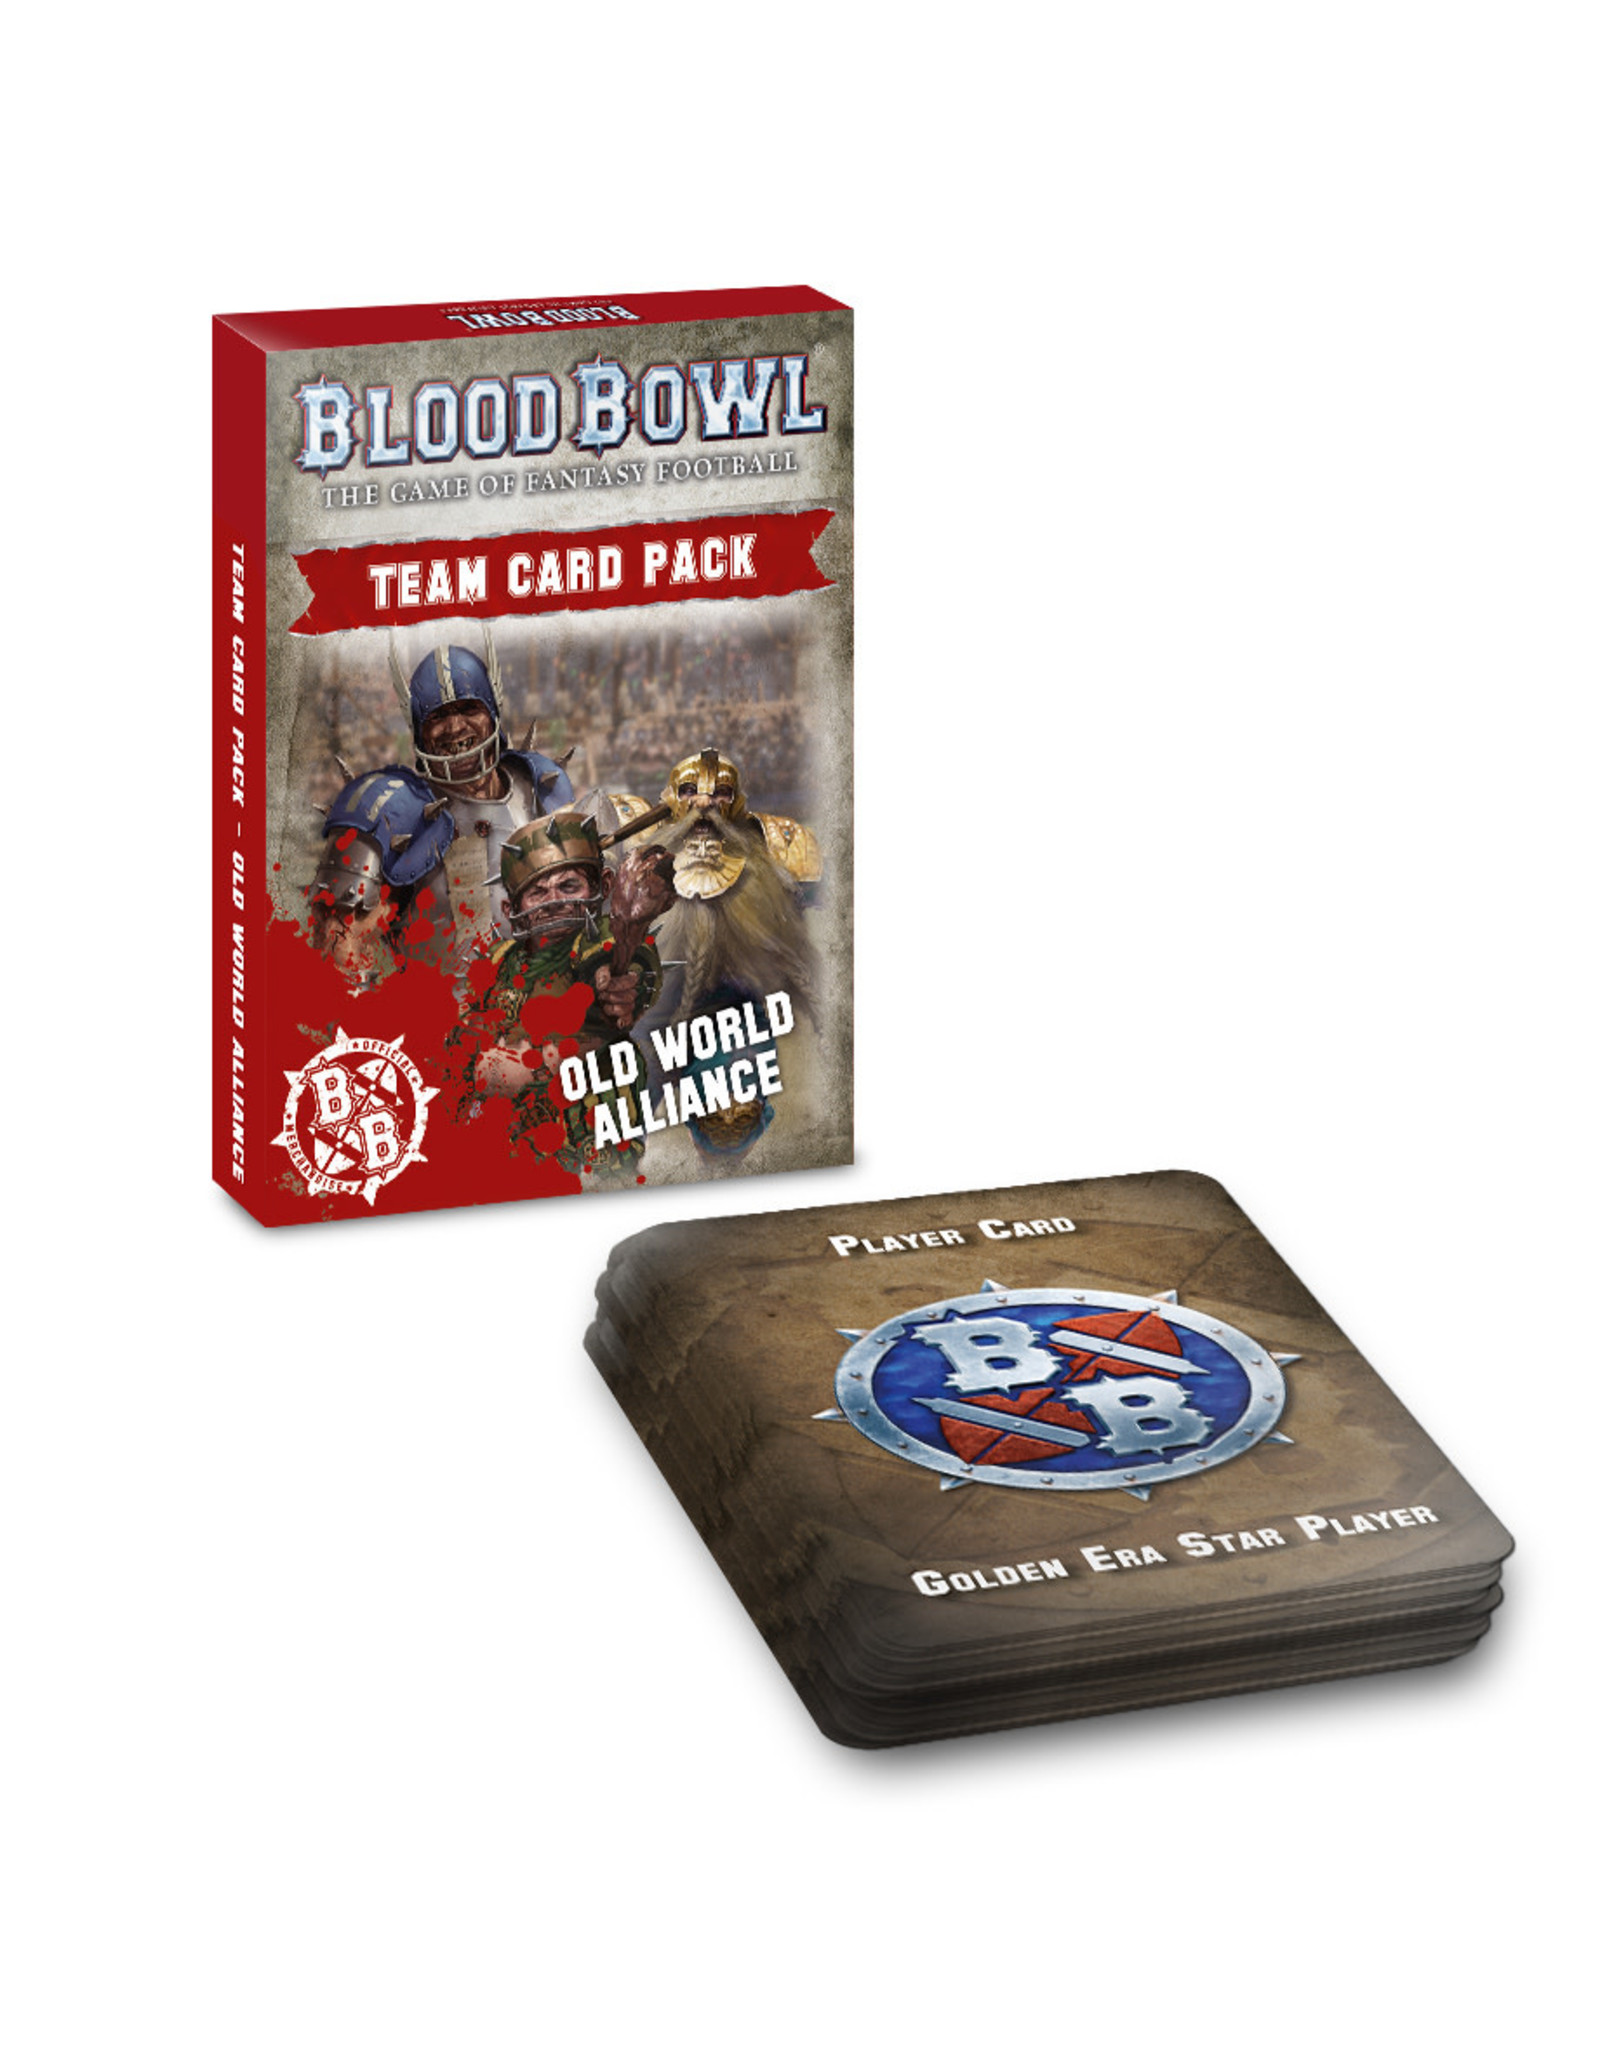 Blood Bowl BLOOD BOWL: OLD WORLD ALLIANCE TEAM CARD2 (English)